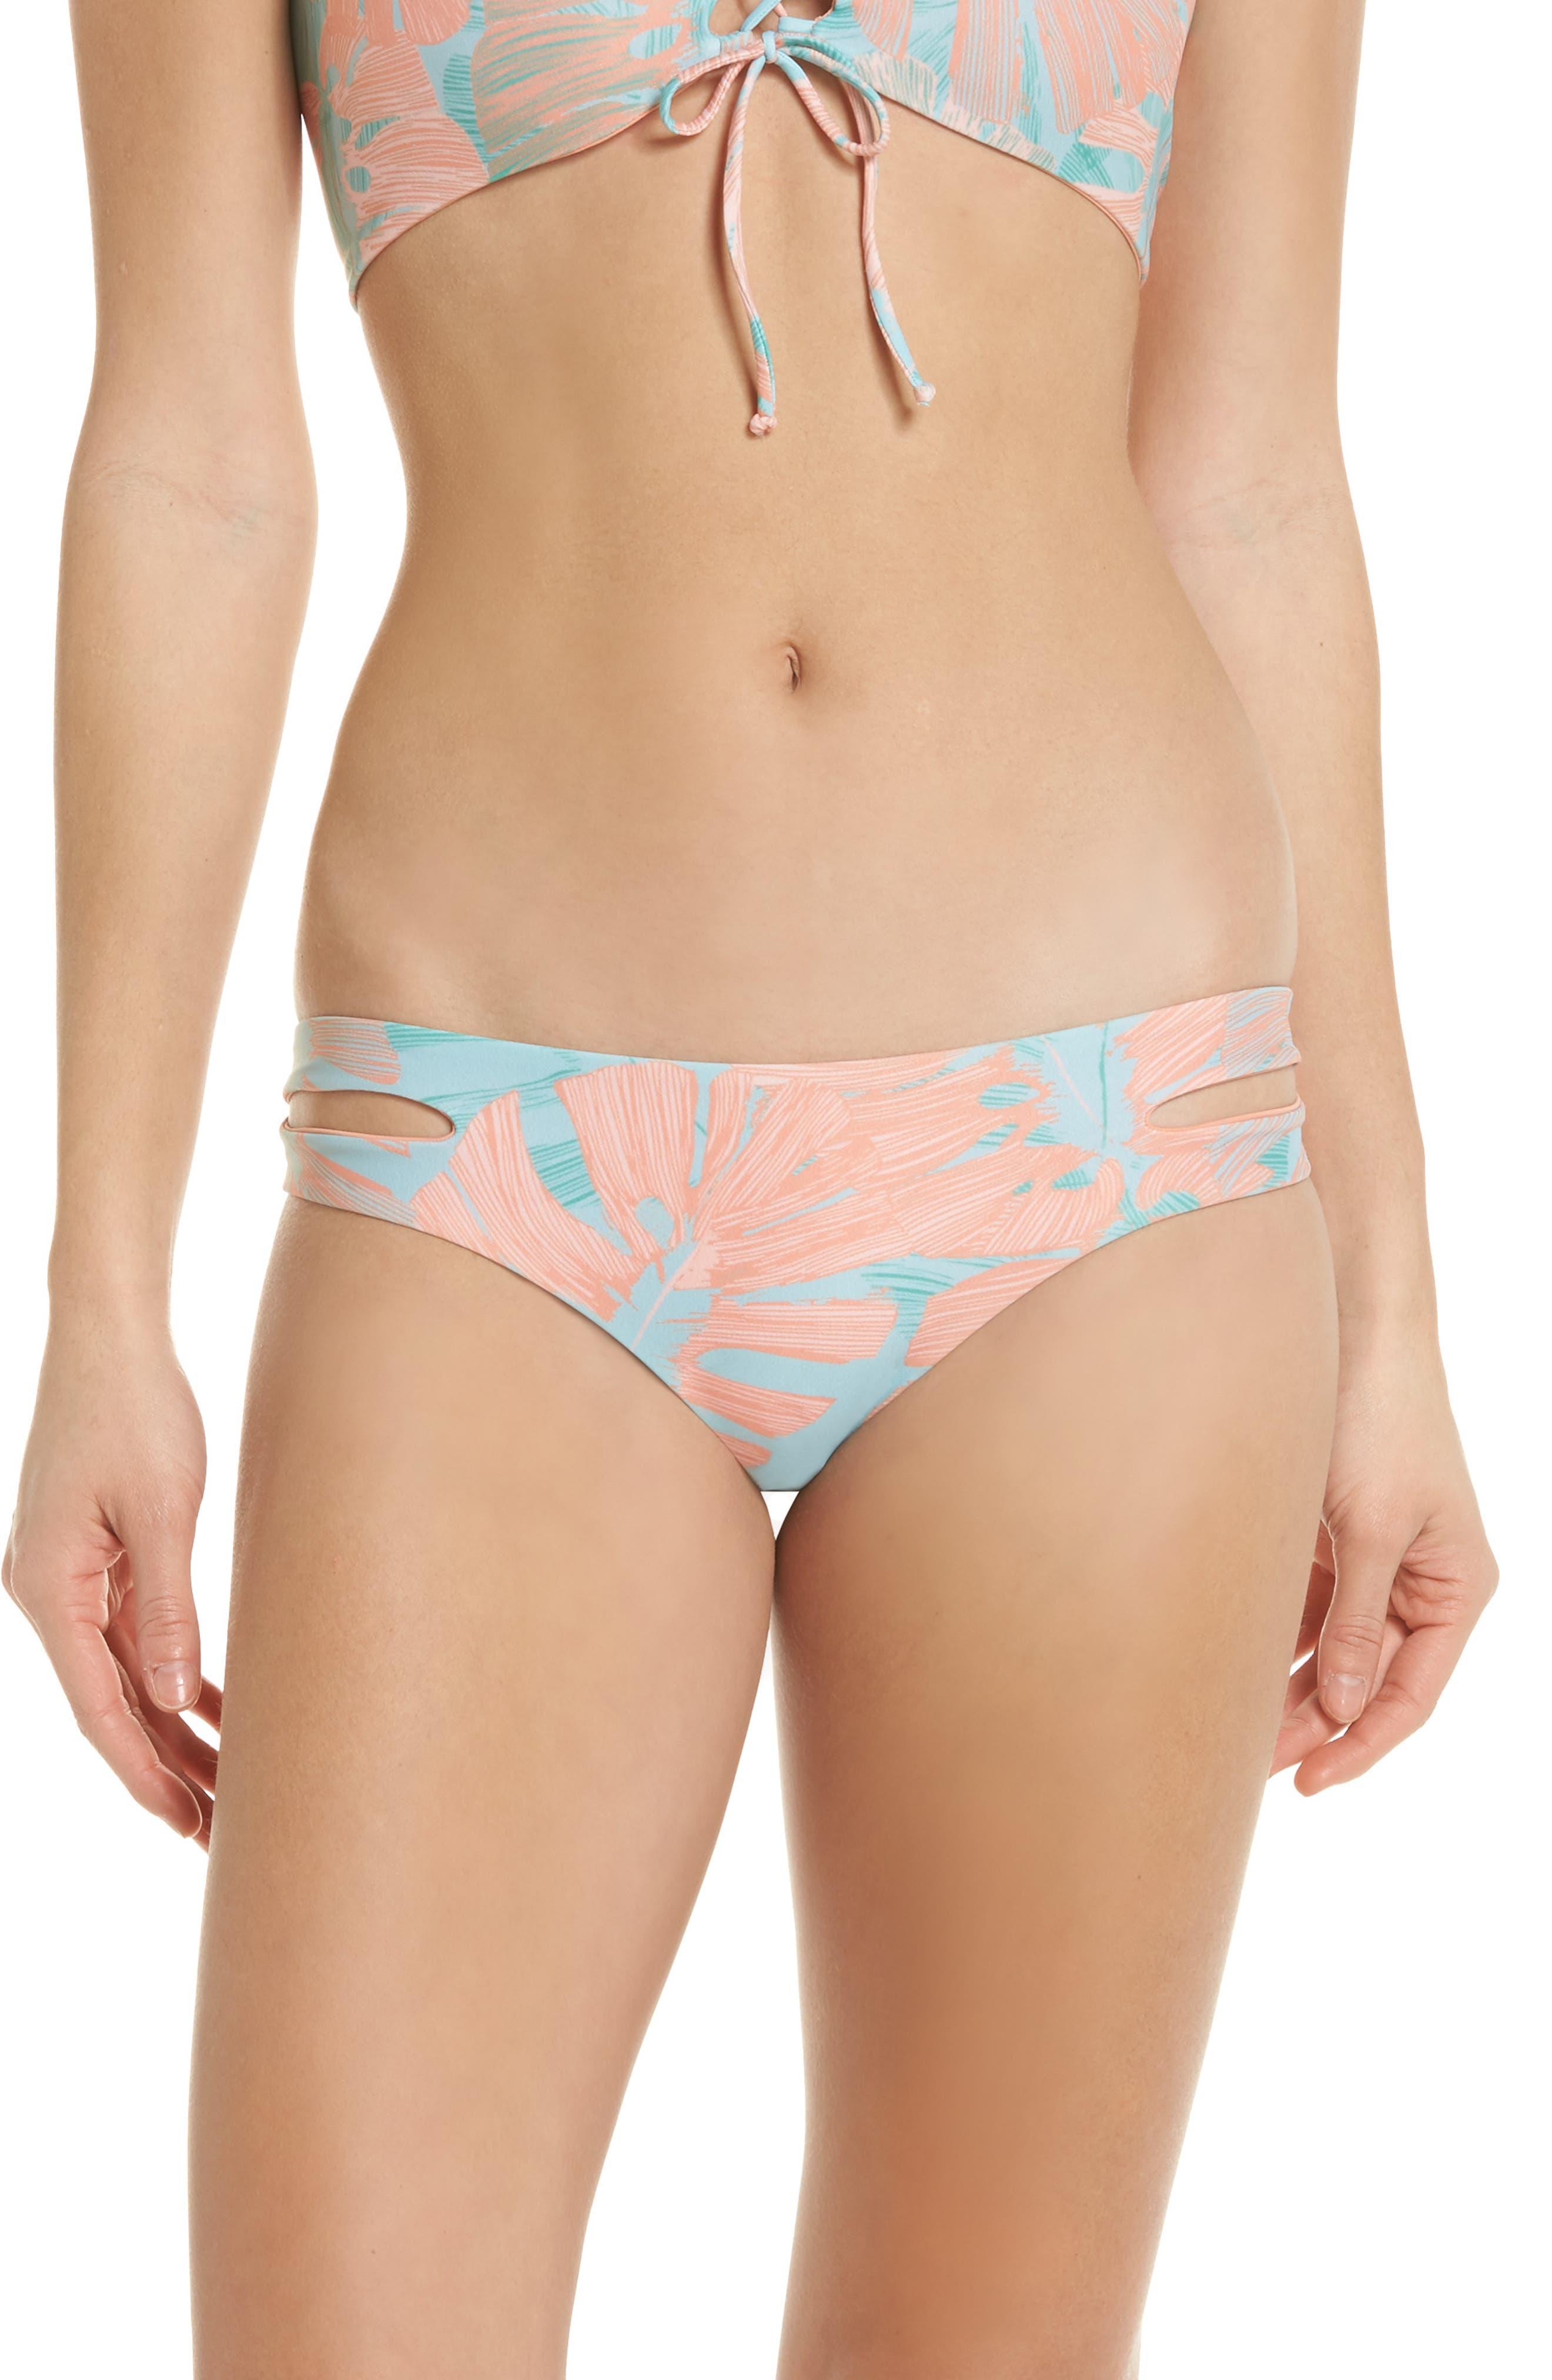 Estella Classic Bikini Bottoms,                             Main thumbnail 1, color,                             Bungalow Palm